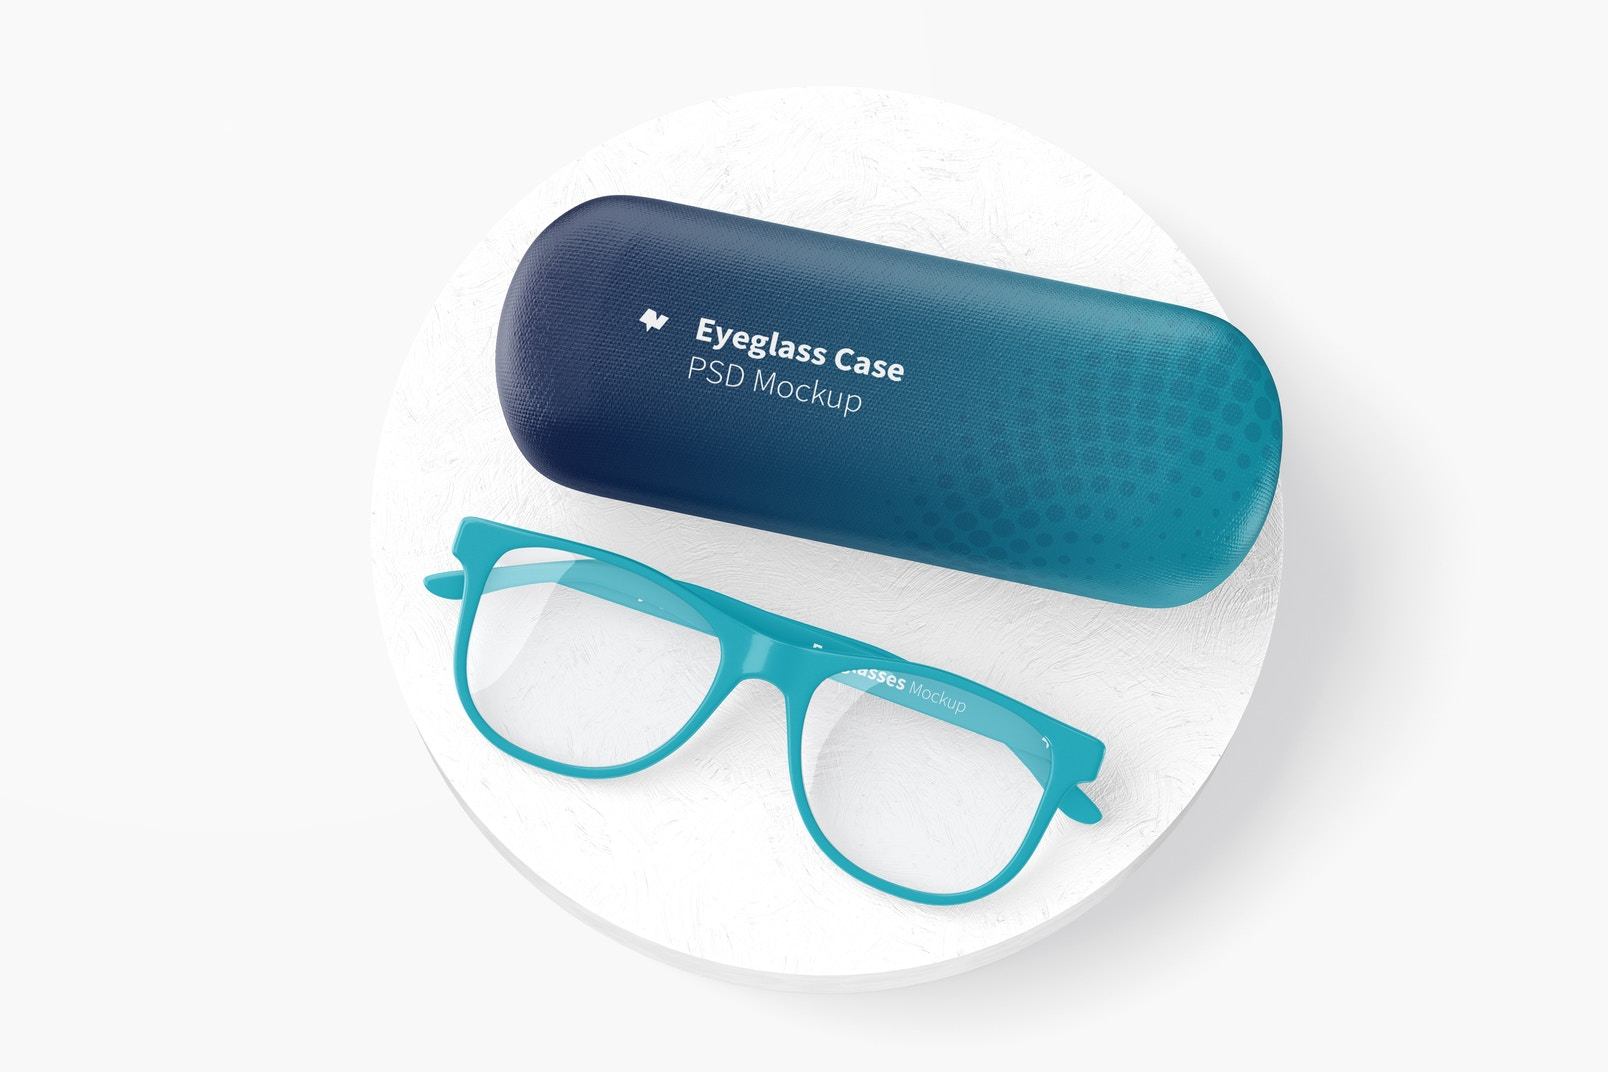 Eyeglass Case Mockup, Top View